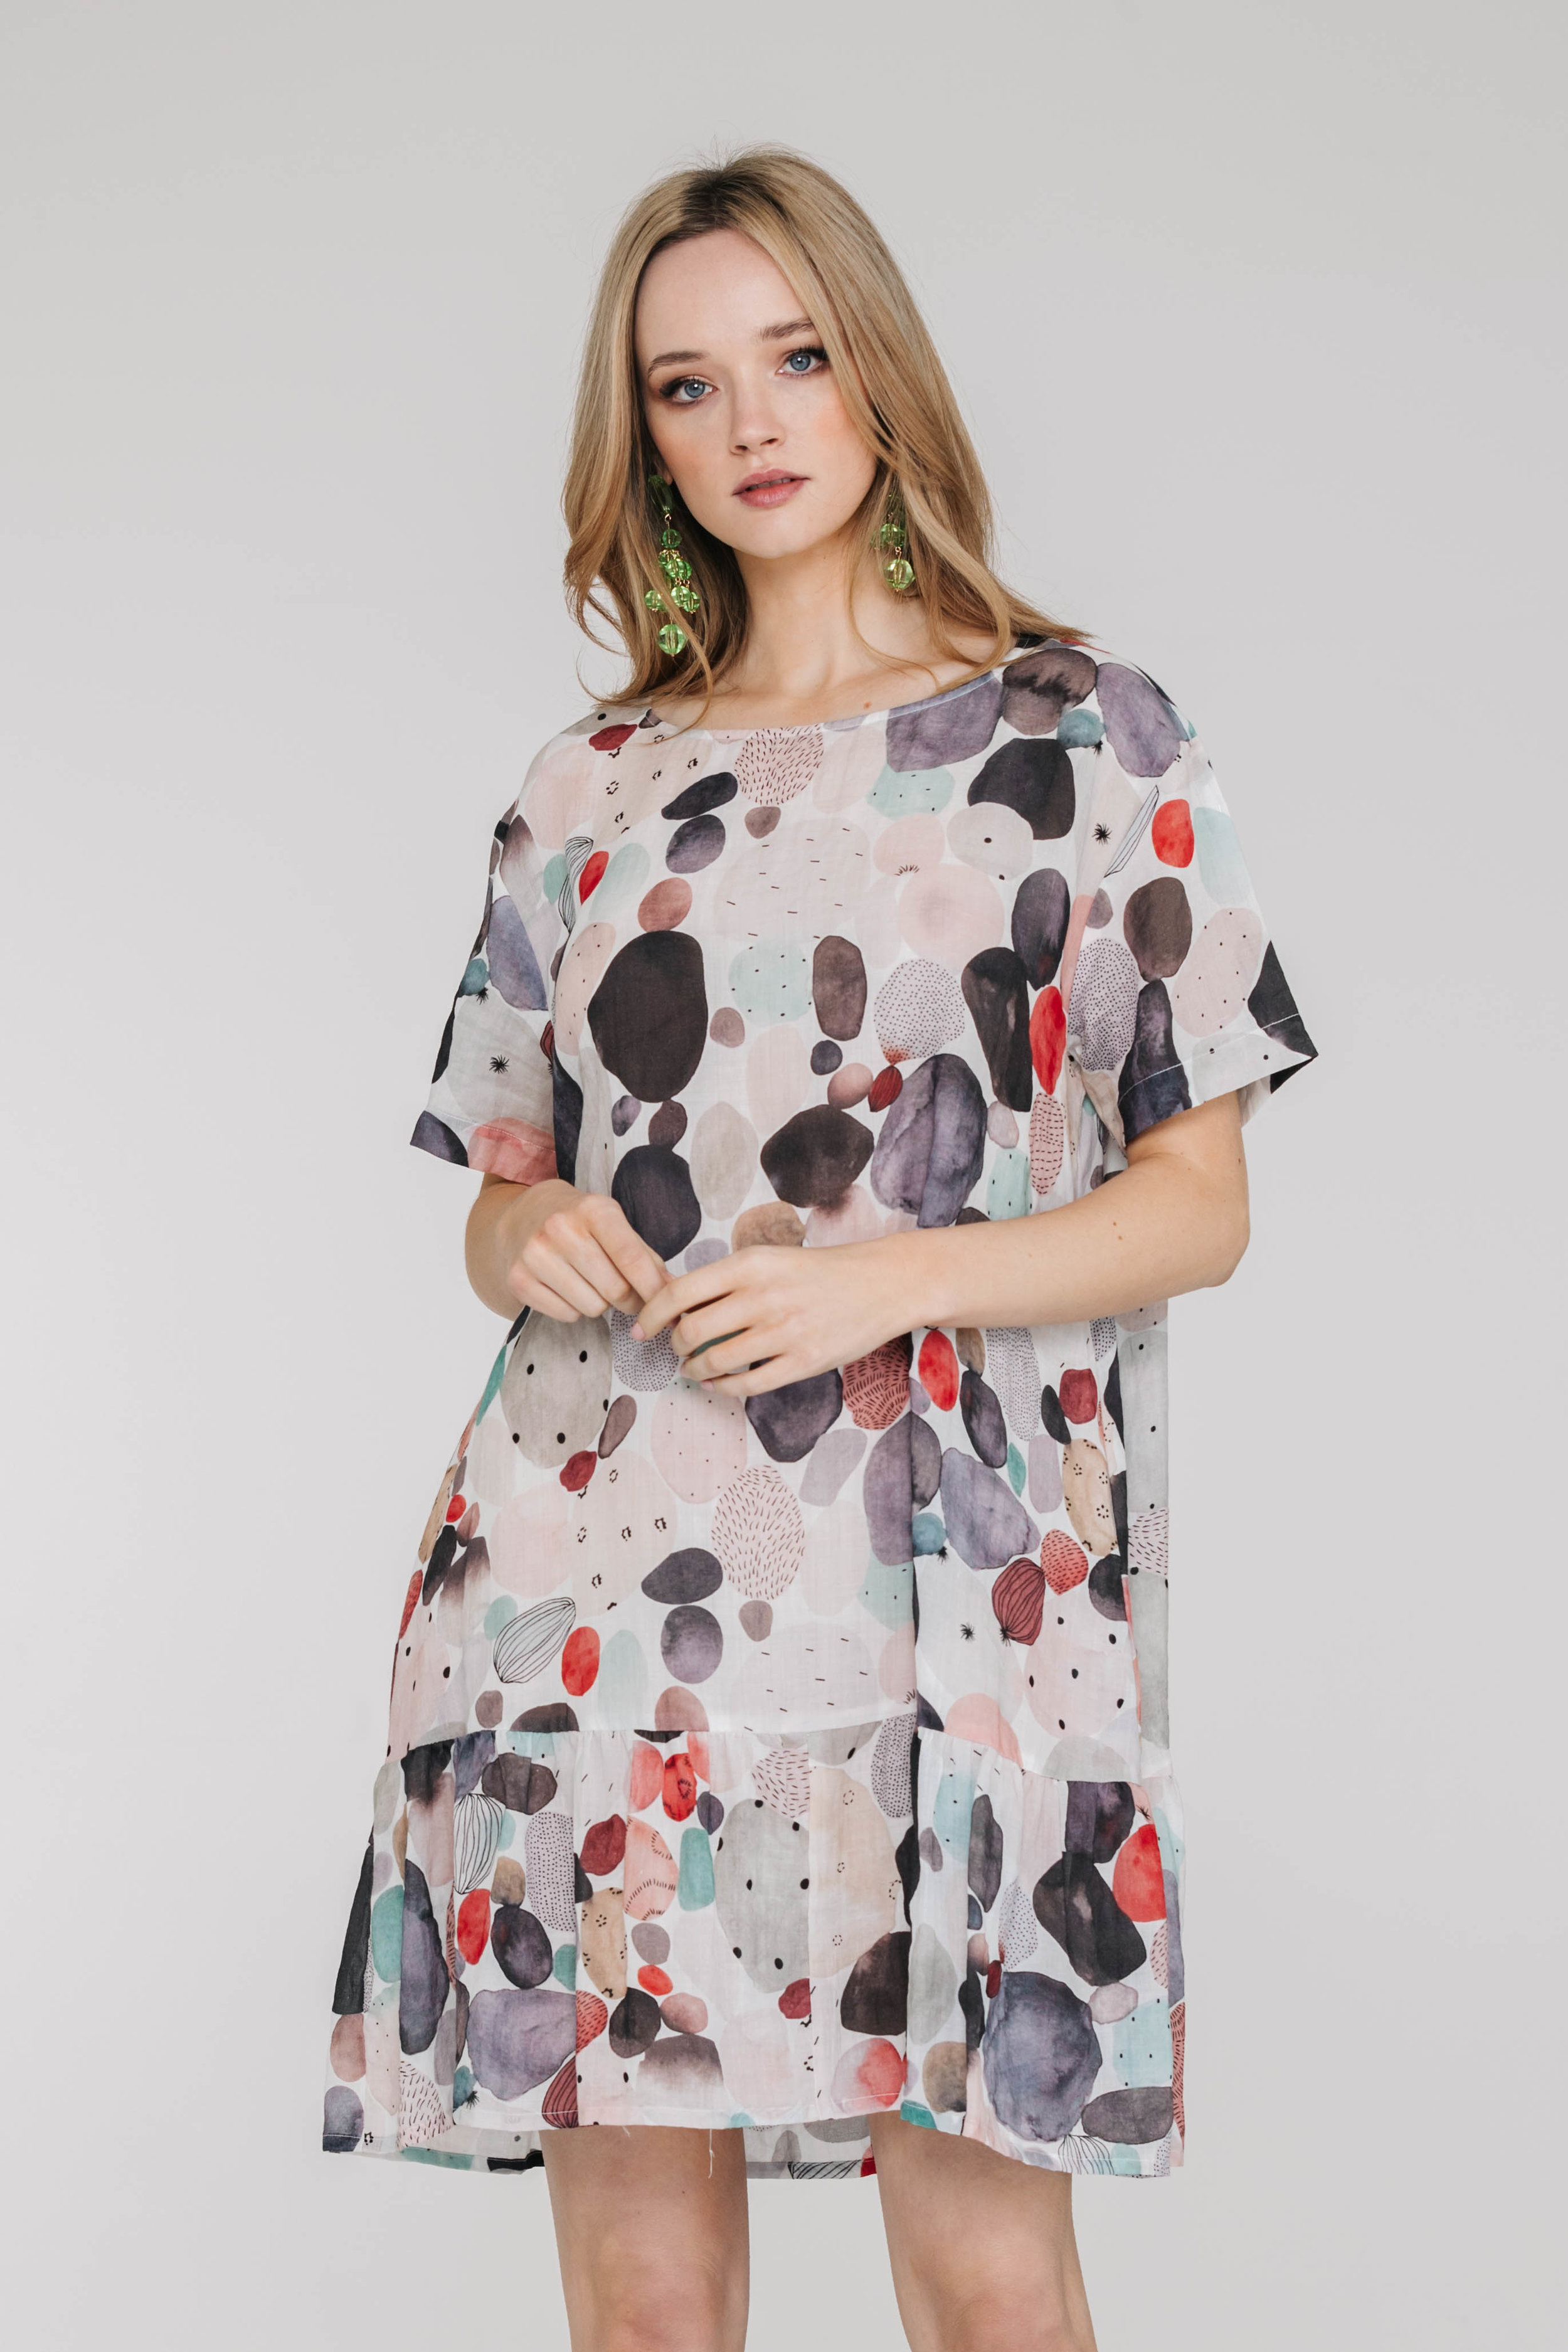 Tulip Dress 6440N Pebbles